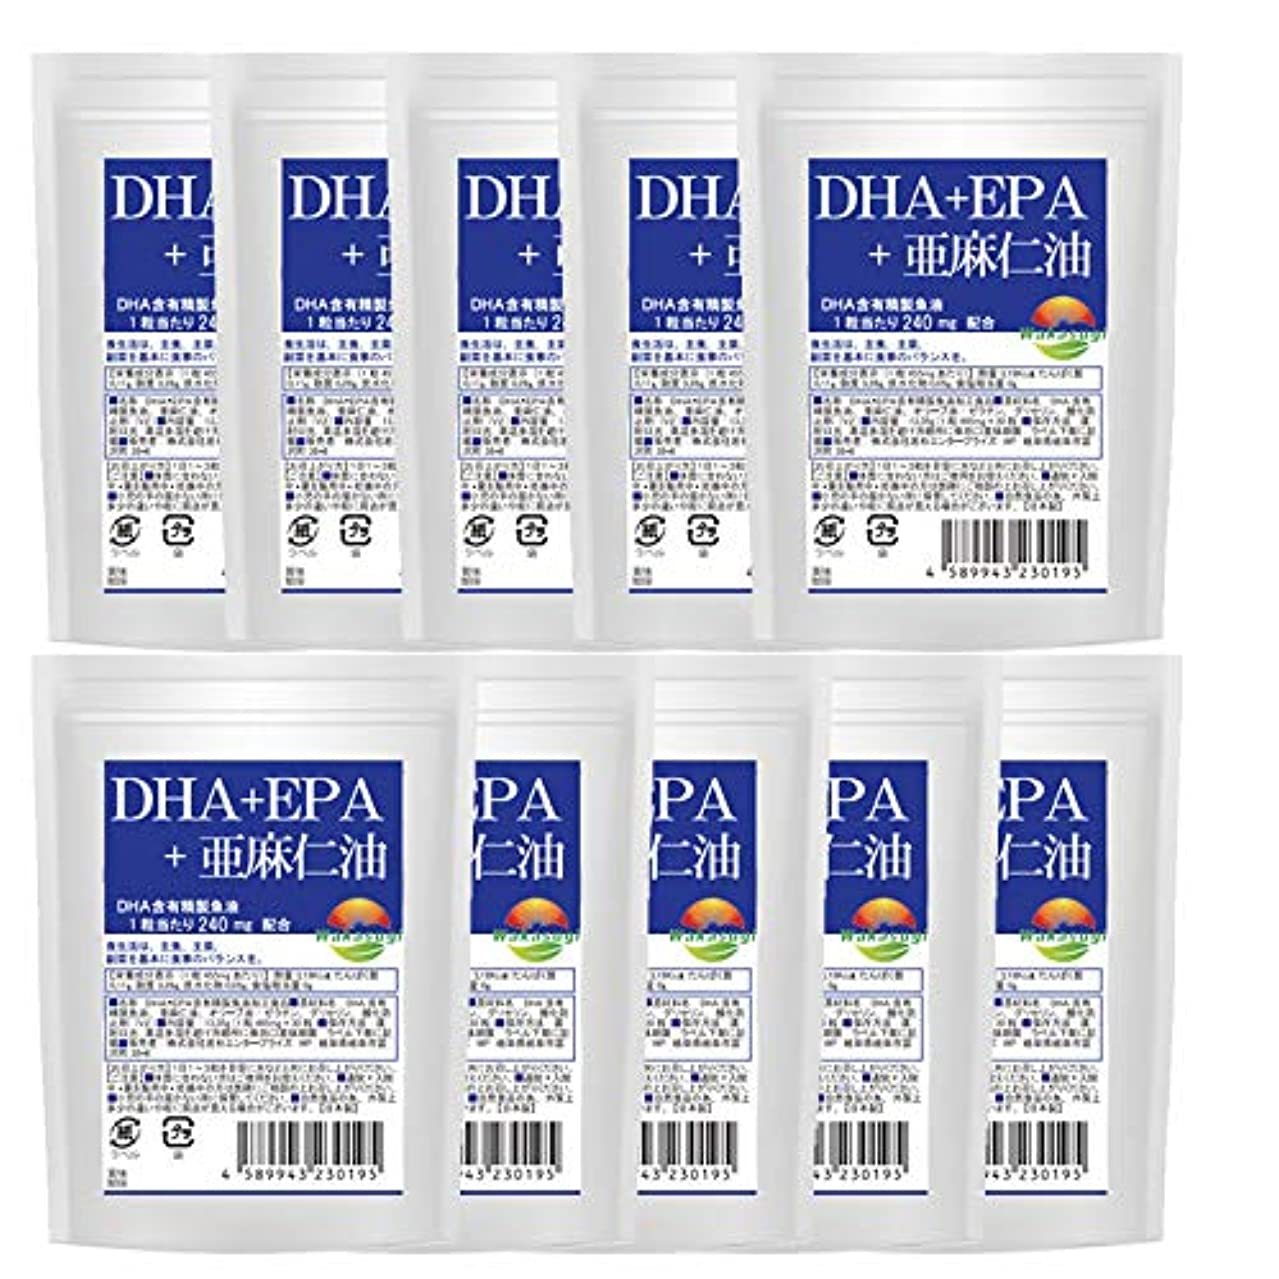 DHA+EPA+亜麻仁油 ソフトカプセル30粒 10袋セット 合計300カプセル まとめ売り